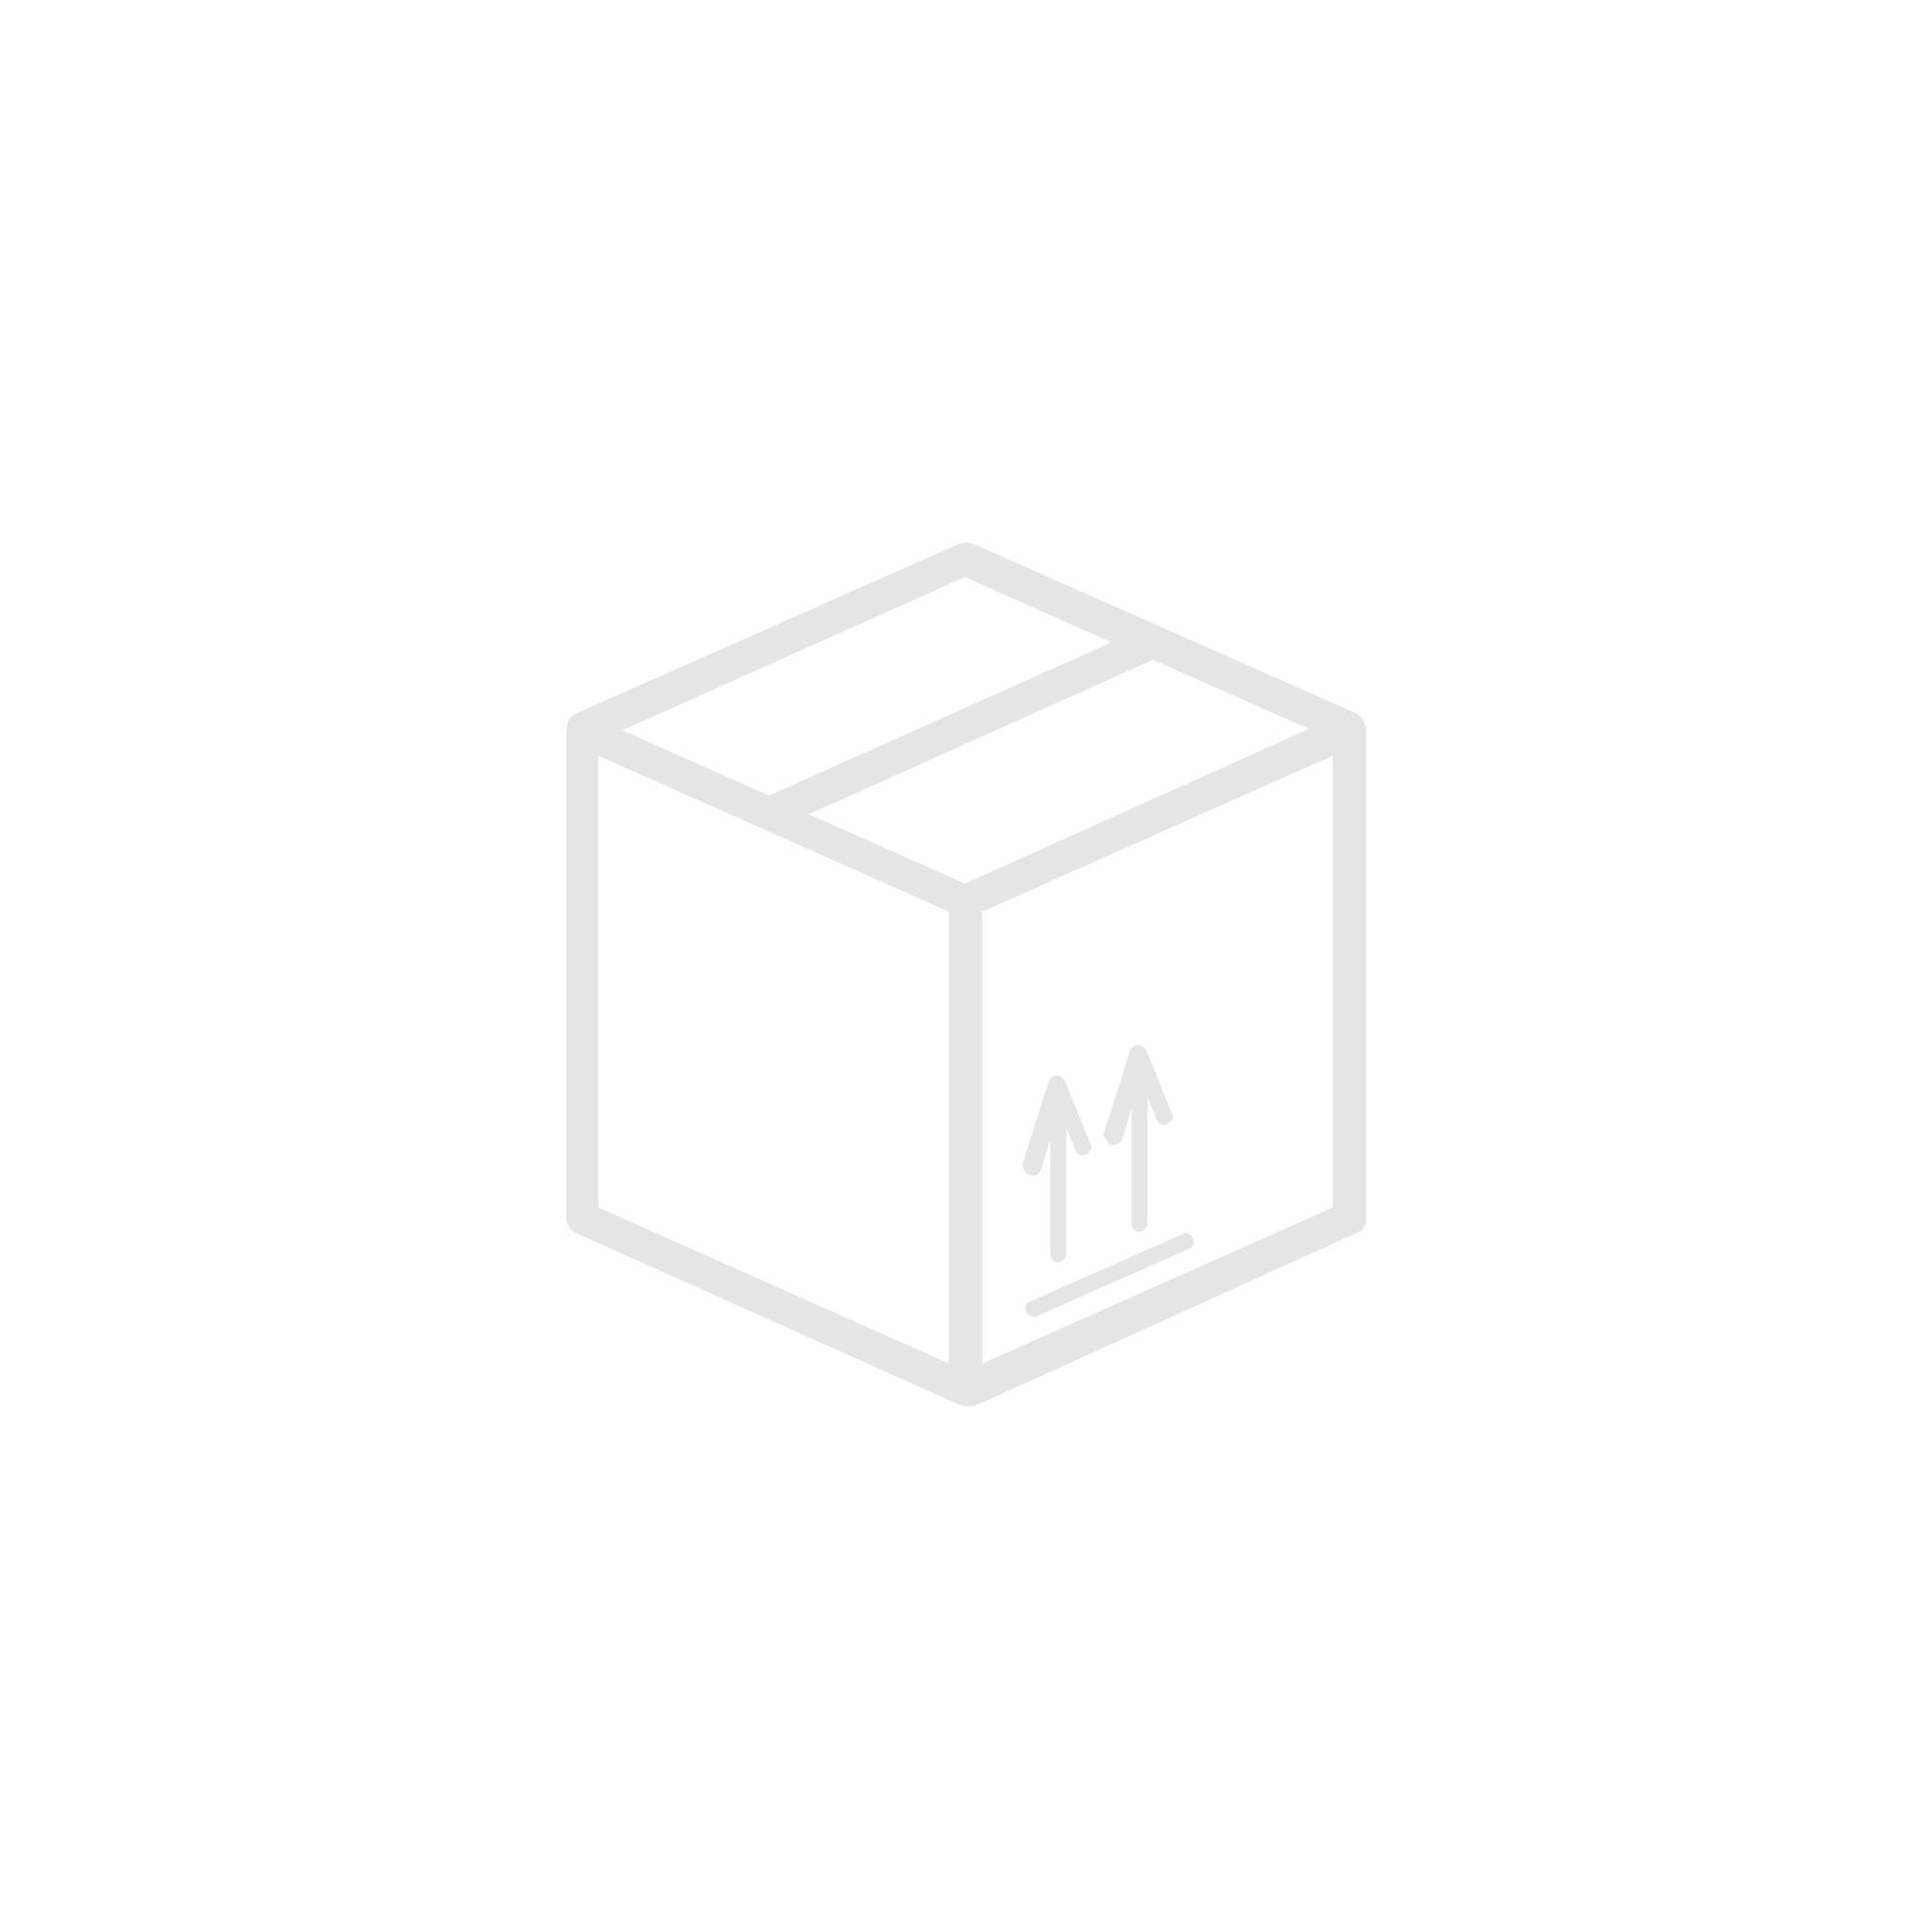 MCLED Svítidlo LED NOEL R 7W 4000K IP65